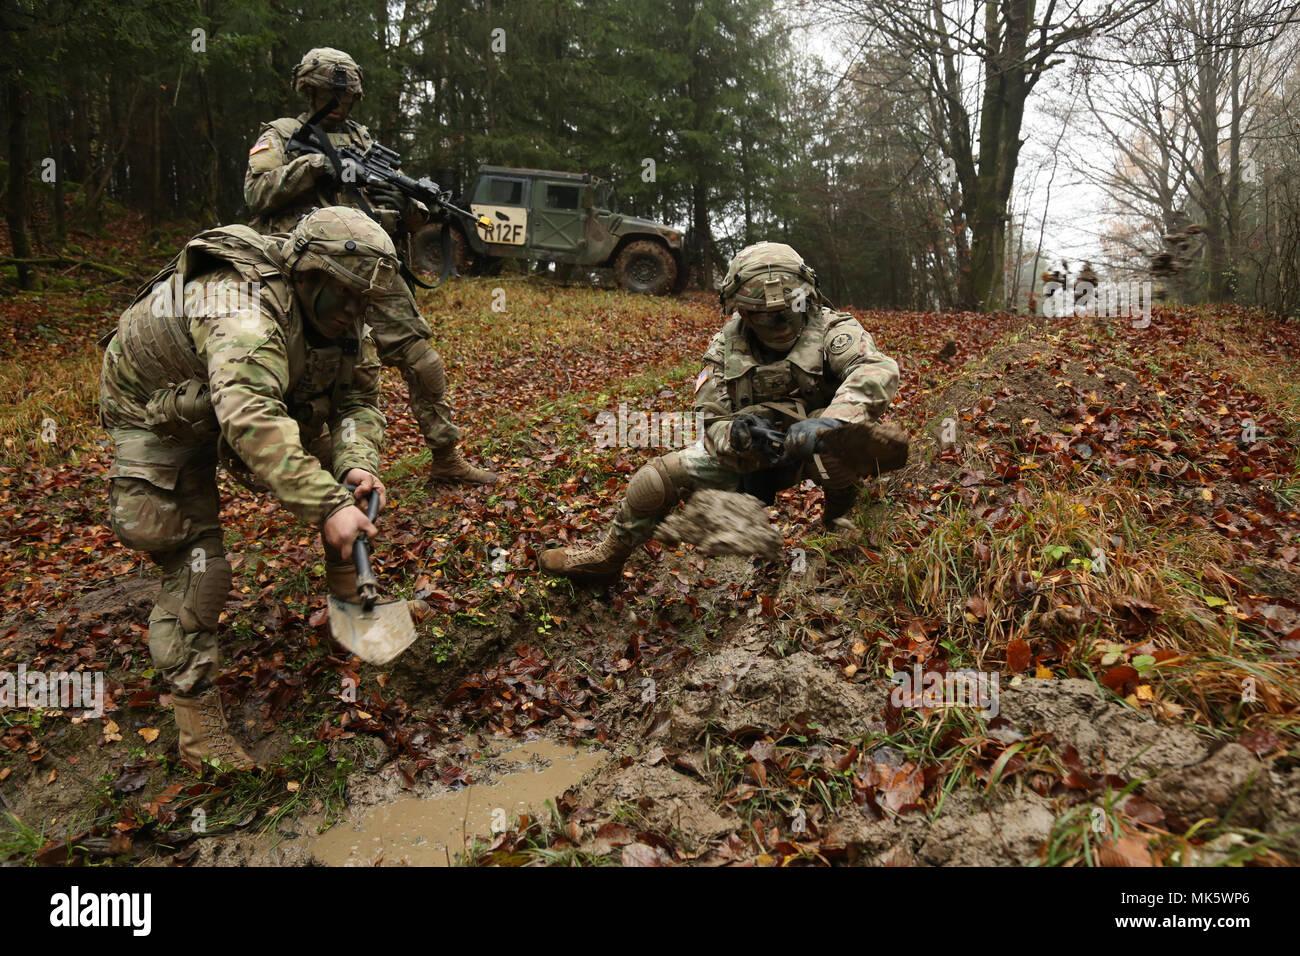 u s soldiers of the 2nd cavalry regiment regimental engineer